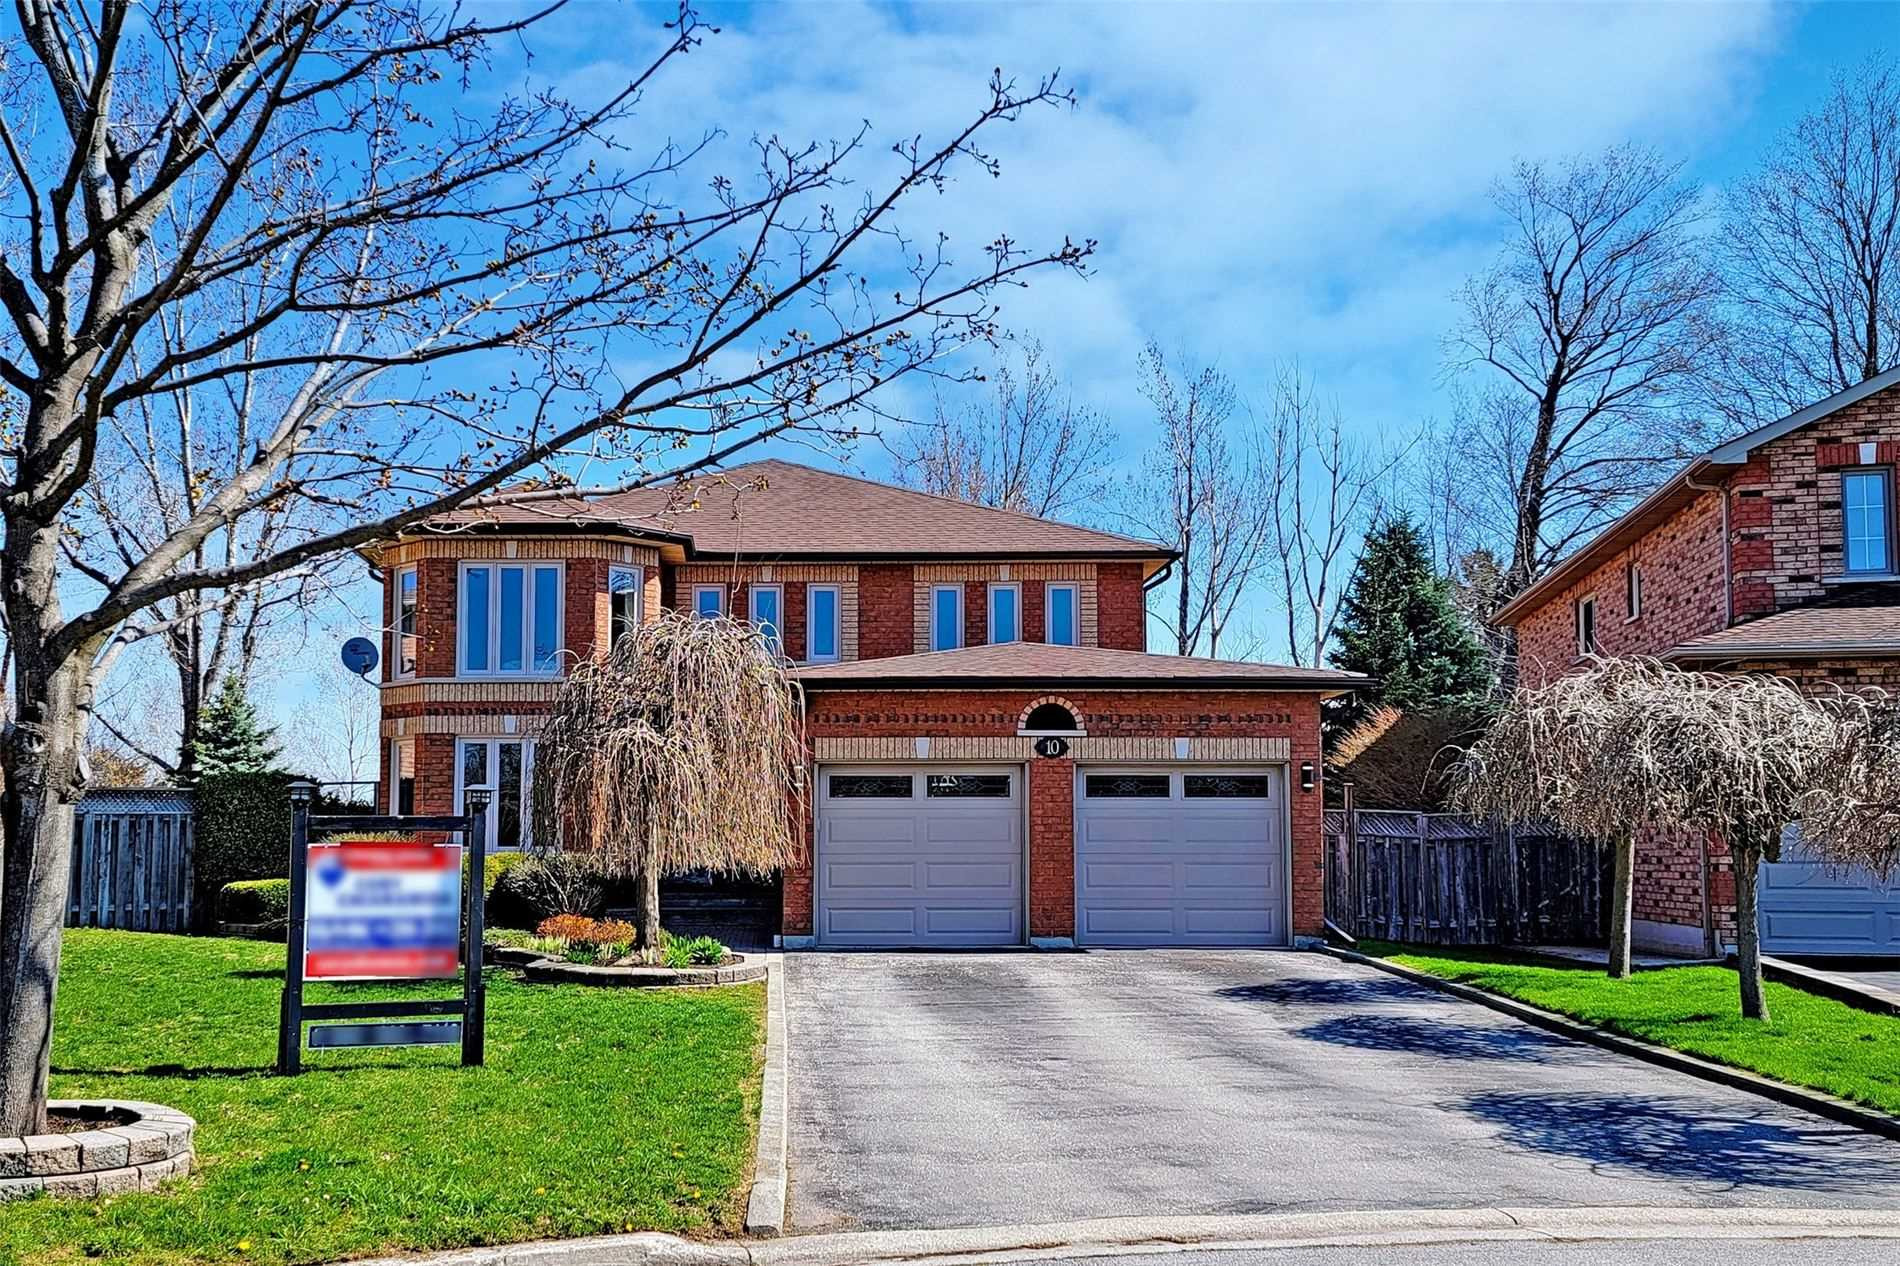 10 Linderwood Dr, Toronto, Ontario M1C3P8, 5 Bedrooms Bedrooms, 9 Rooms Rooms,4 BathroomsBathrooms,Detached,For Sale,Linderwood,E5211642